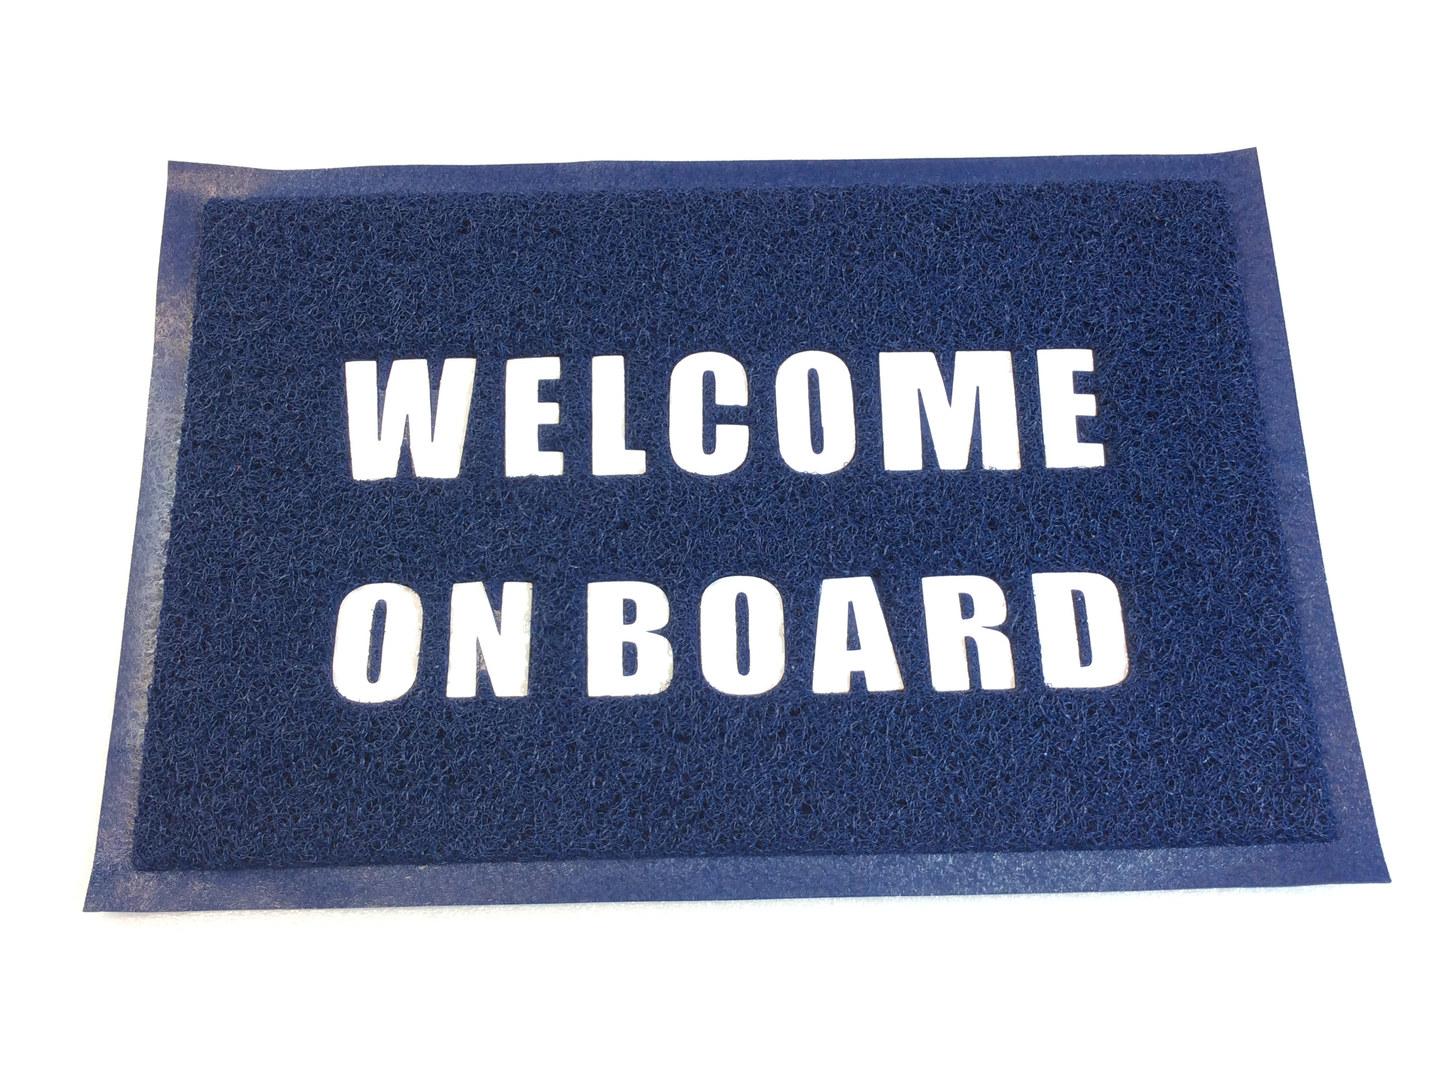 Fussmatte WELCOME ON BOARD SMA Nautic Sh